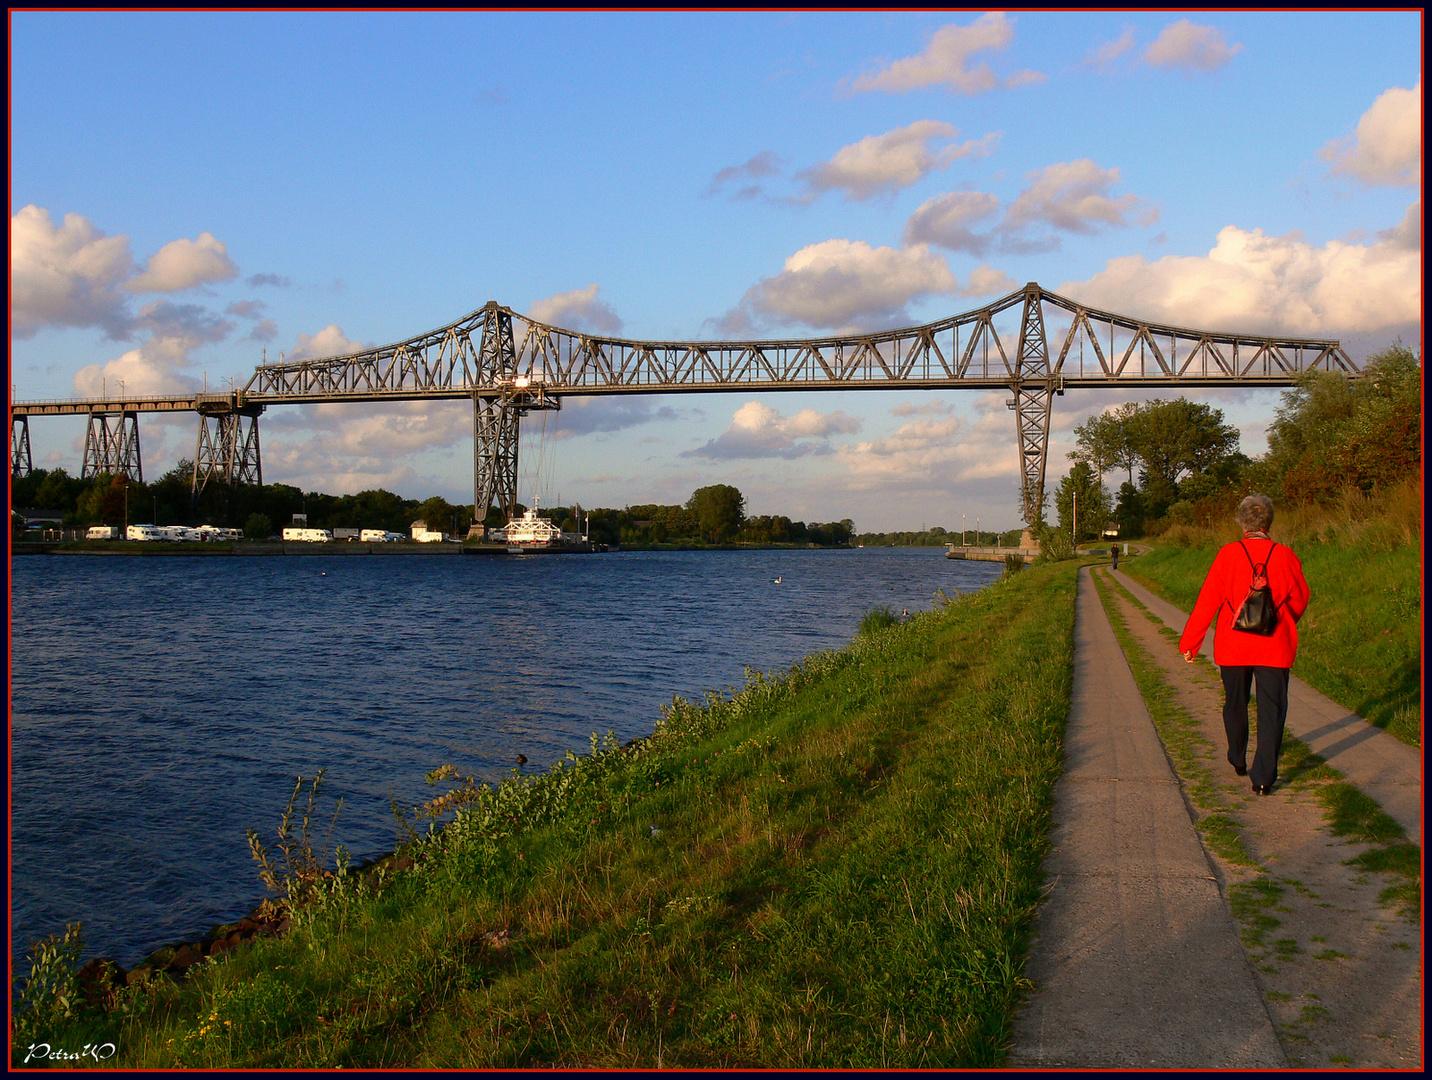 Spaziergang am Nord-Ostsee-Kanal